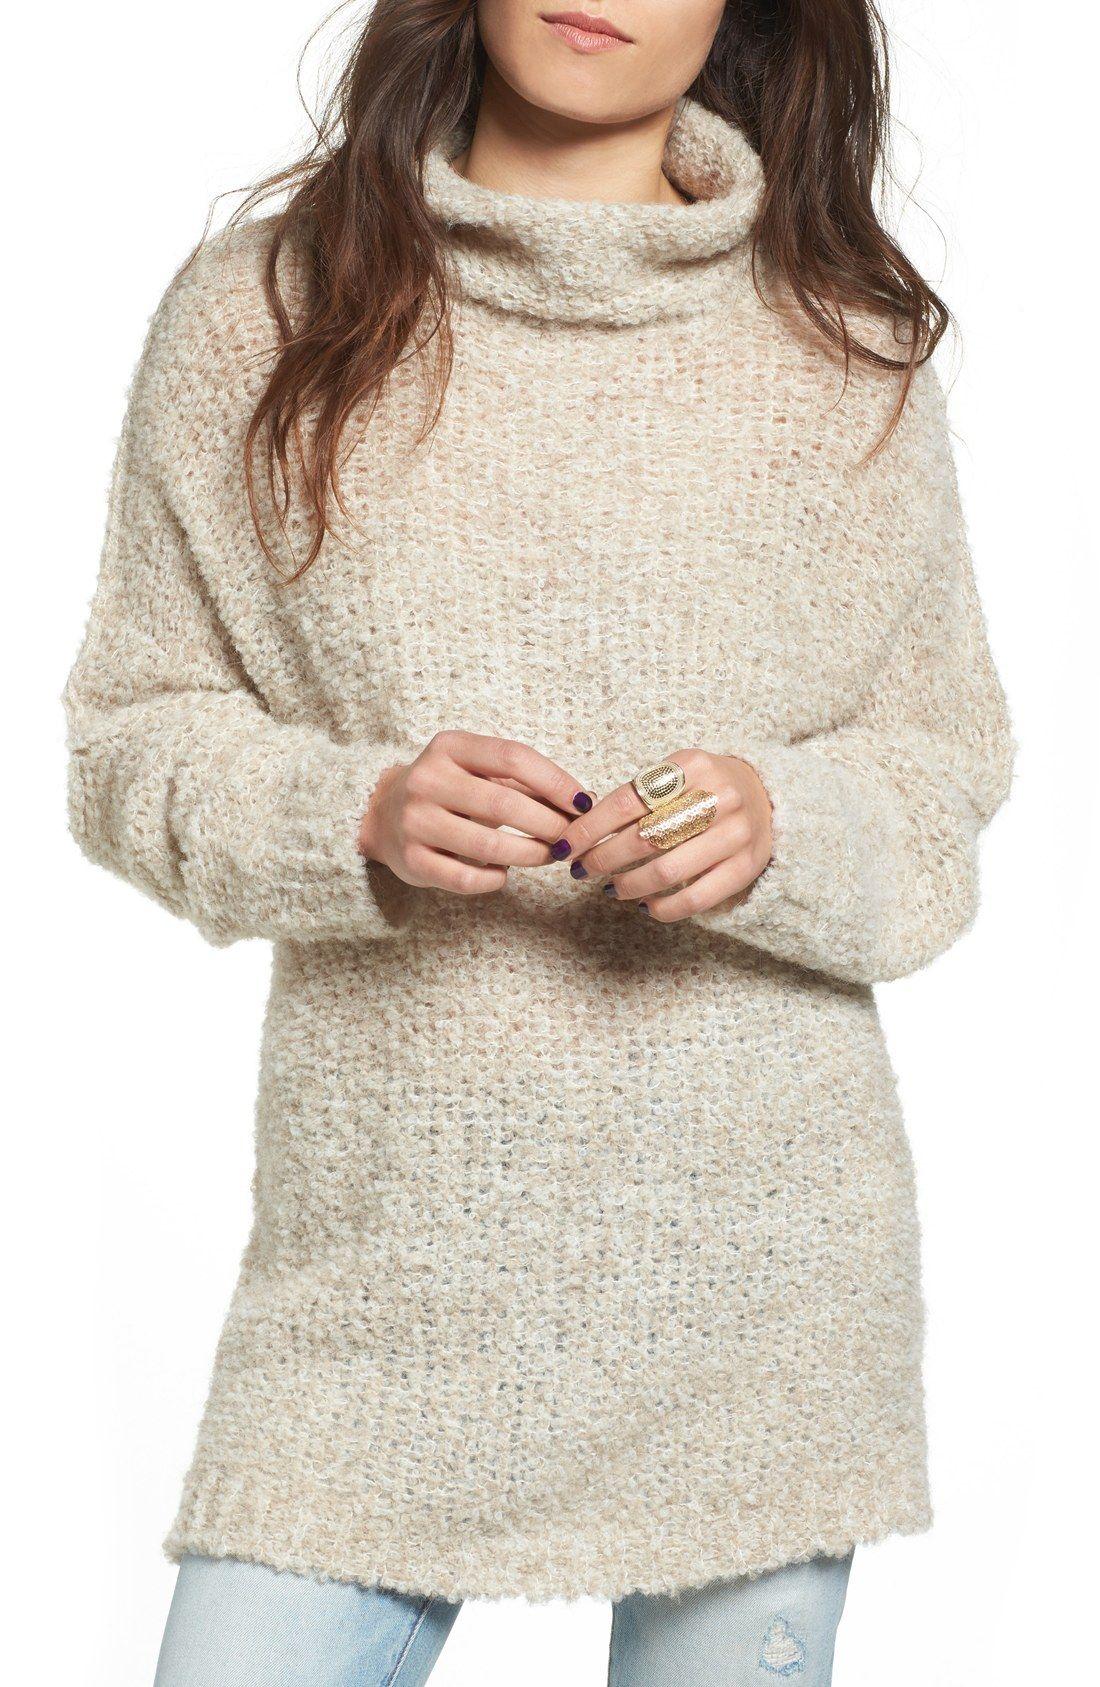 free peopl knit turtleneck sweater | Shirts/Sweaters | Pinterest ...